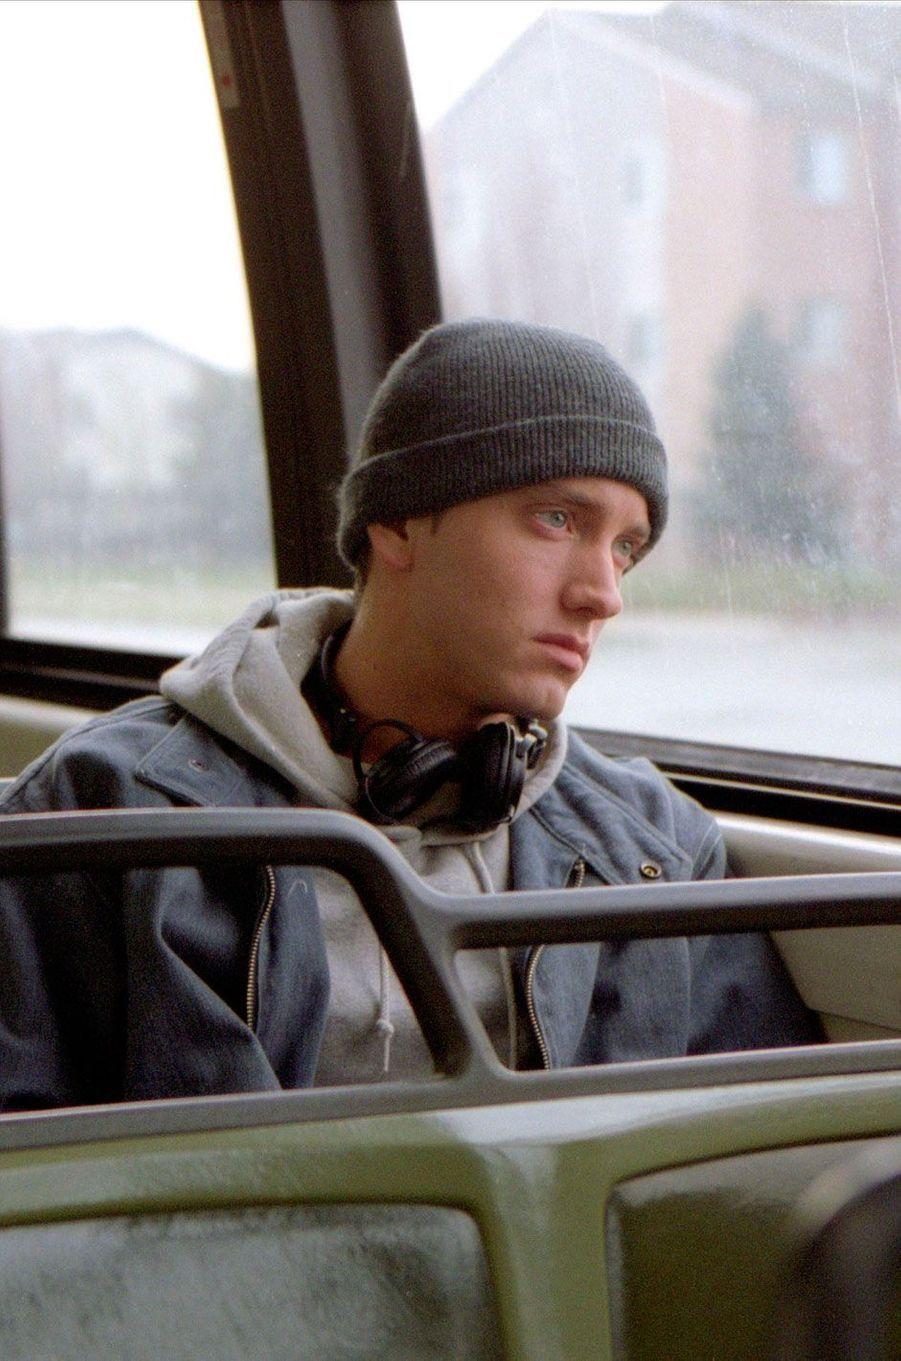 Eminem s'appelle Marshall Bruce Mathers III